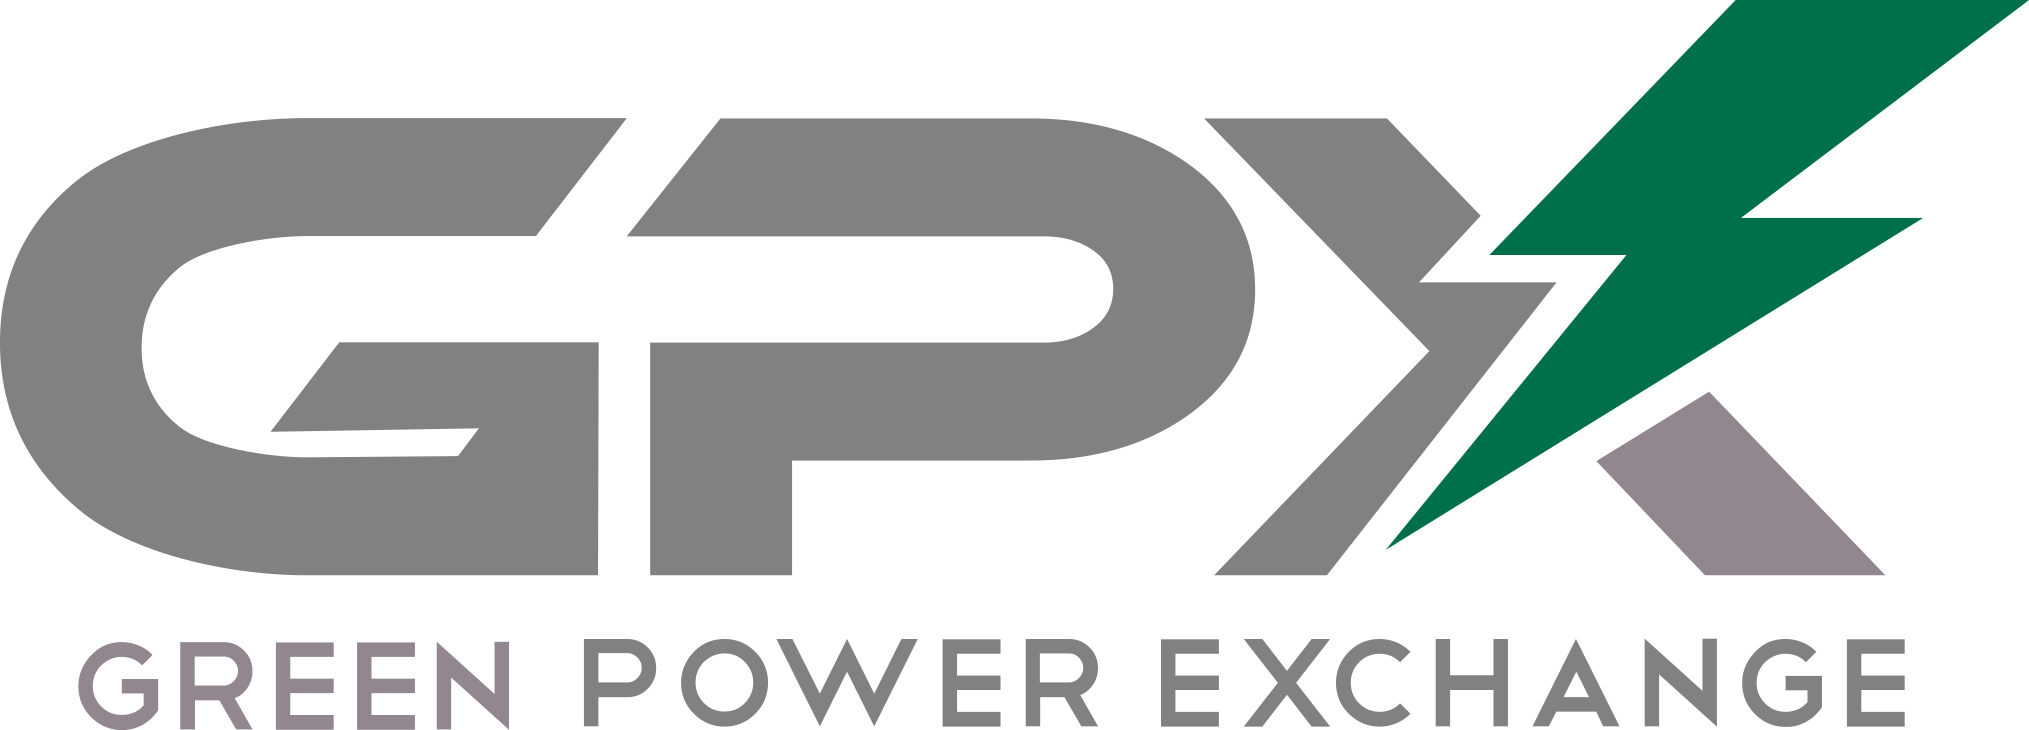 green power exchange.png